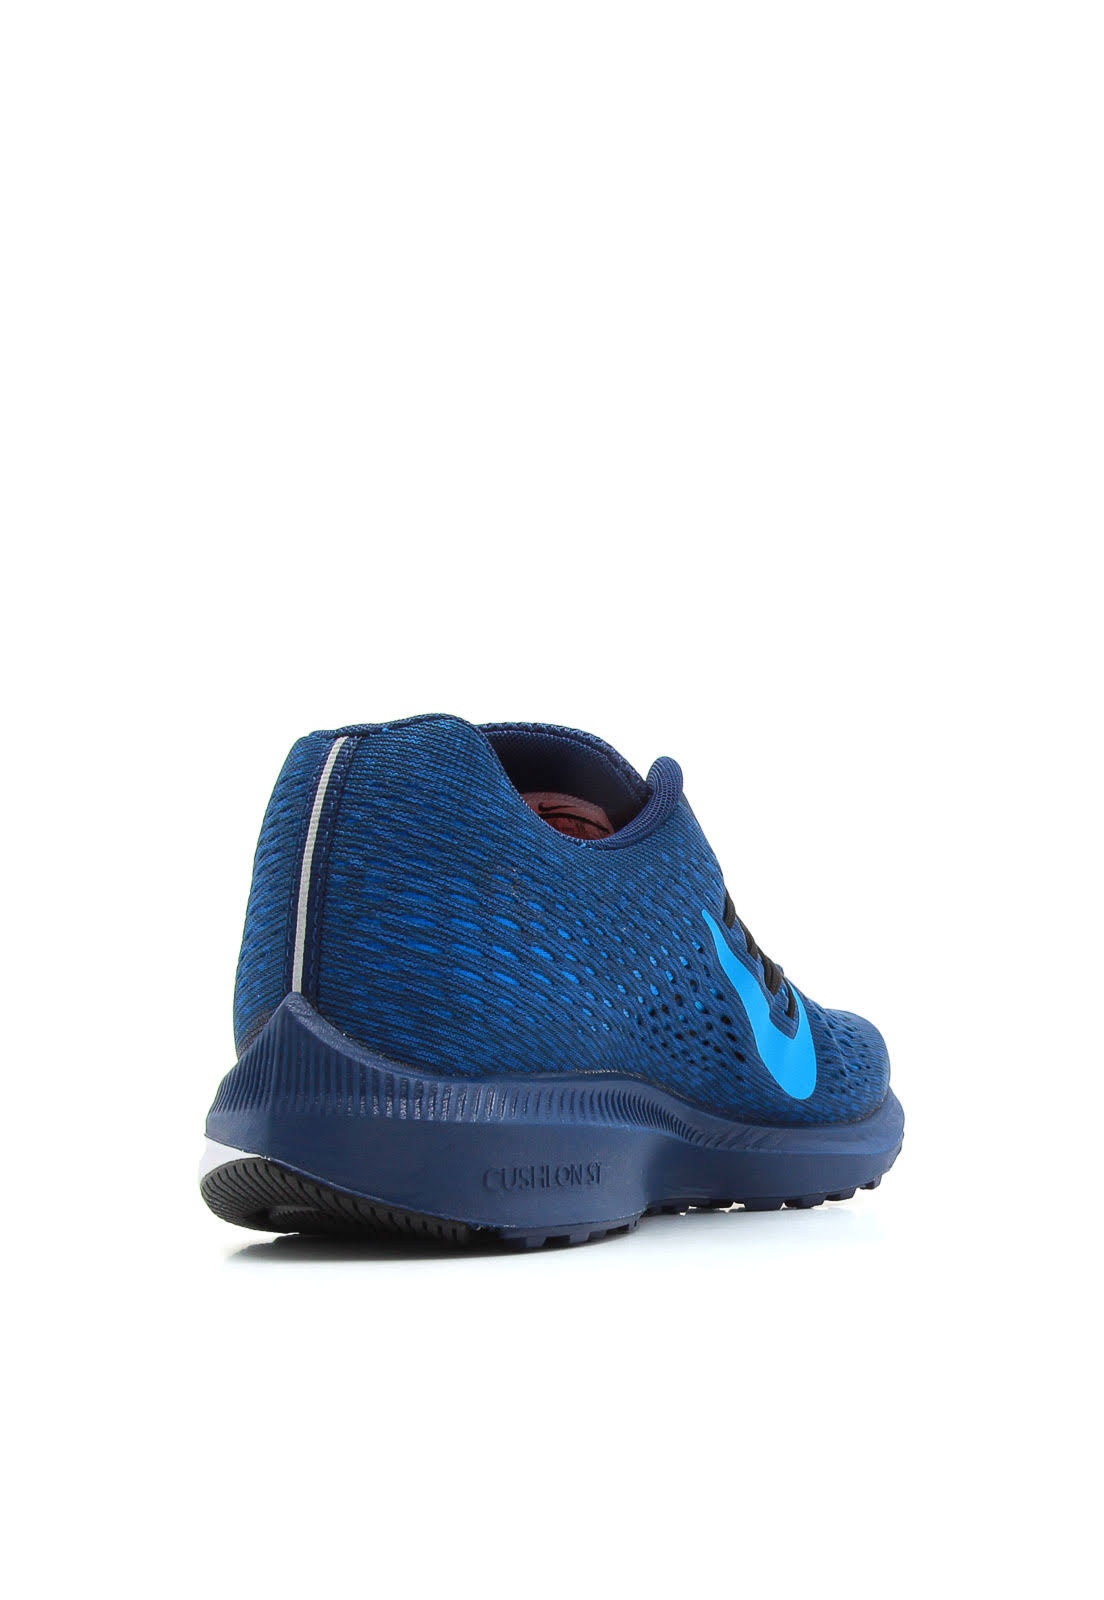 Winflo HerenschoenenBlauw Bluevoidphotoblueindigo Nike Zoom 5 0POkN8wXn